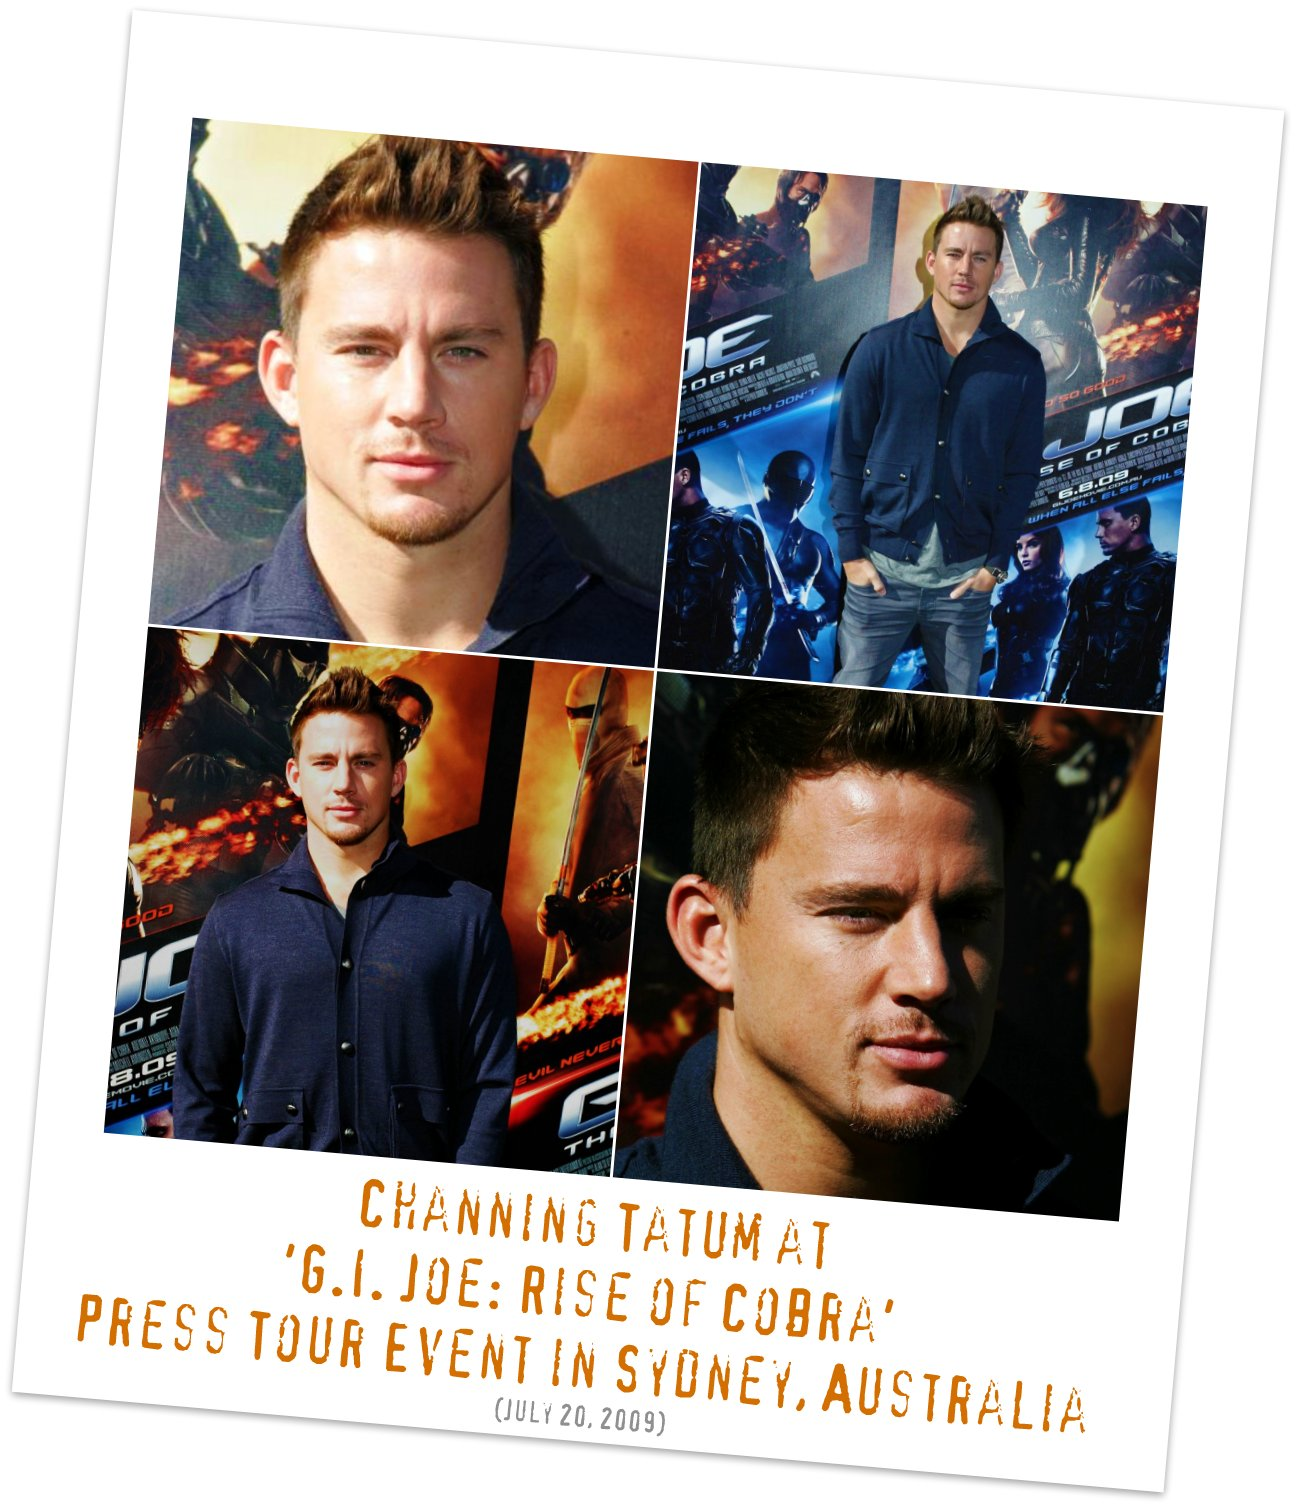 Channing Tatum on the 'G.I. Joe: Rise of Cobra' Press Tour